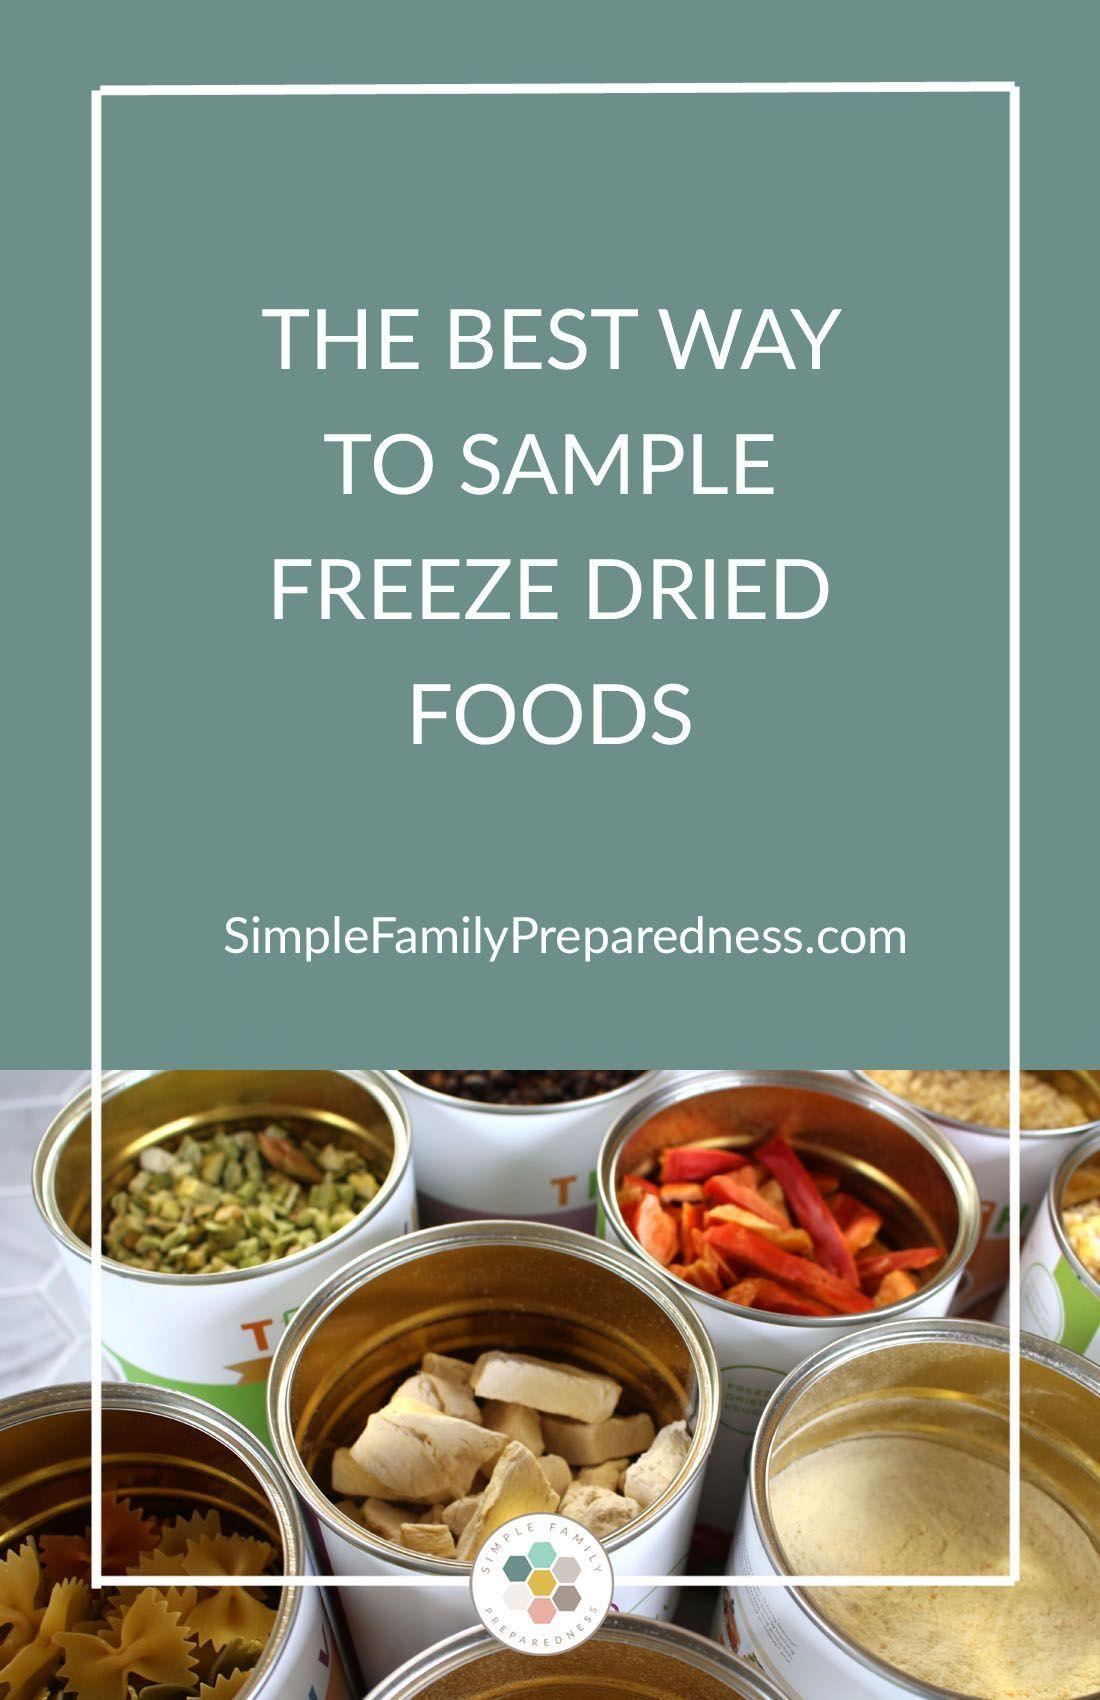 emergencydryfood Freeze drying food, Emergency